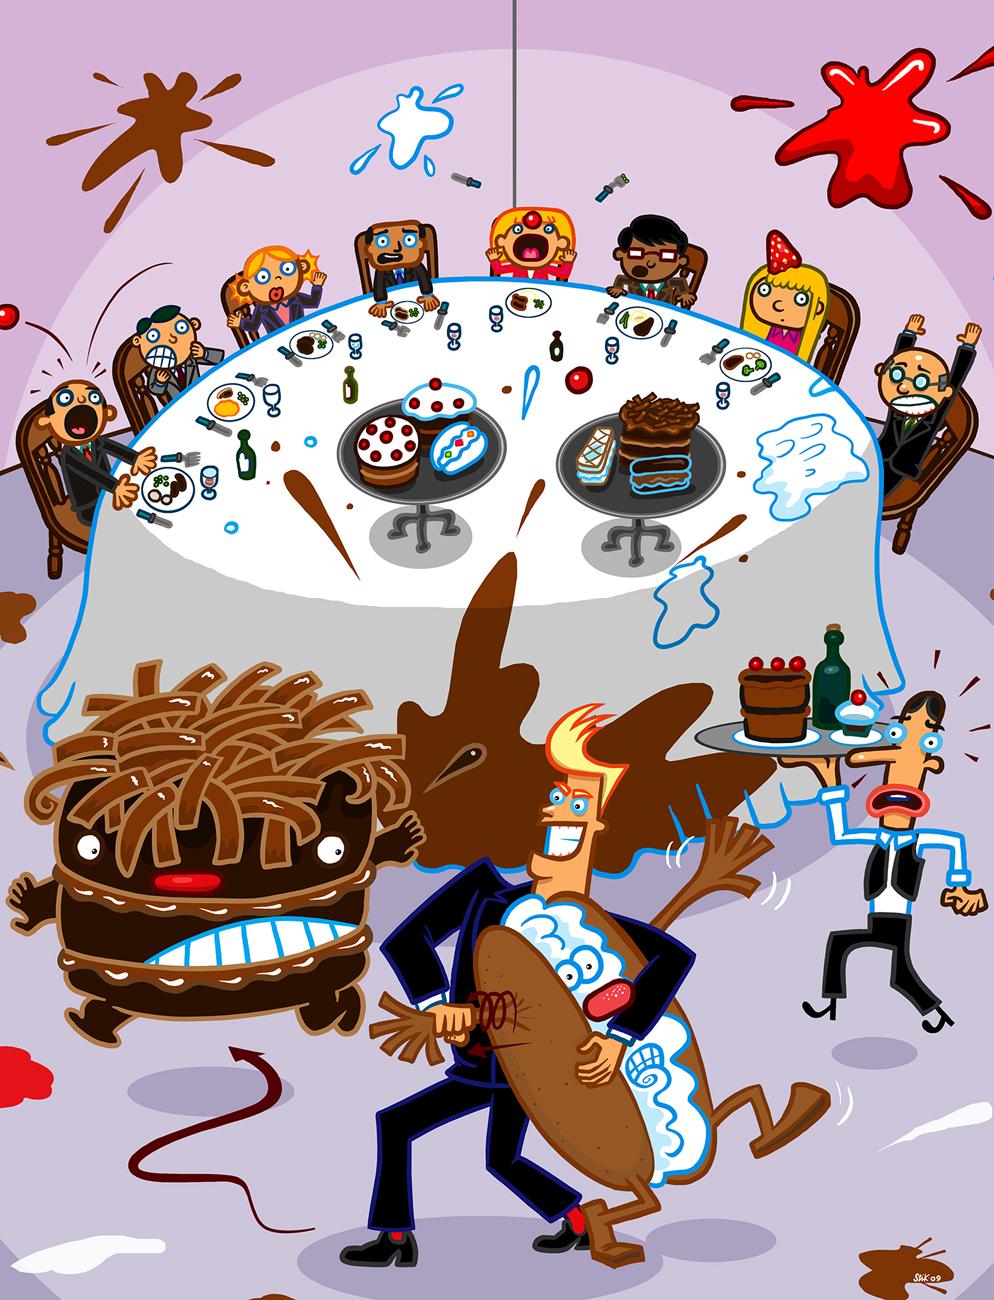 Dinner party illustration by Bill Greenhead